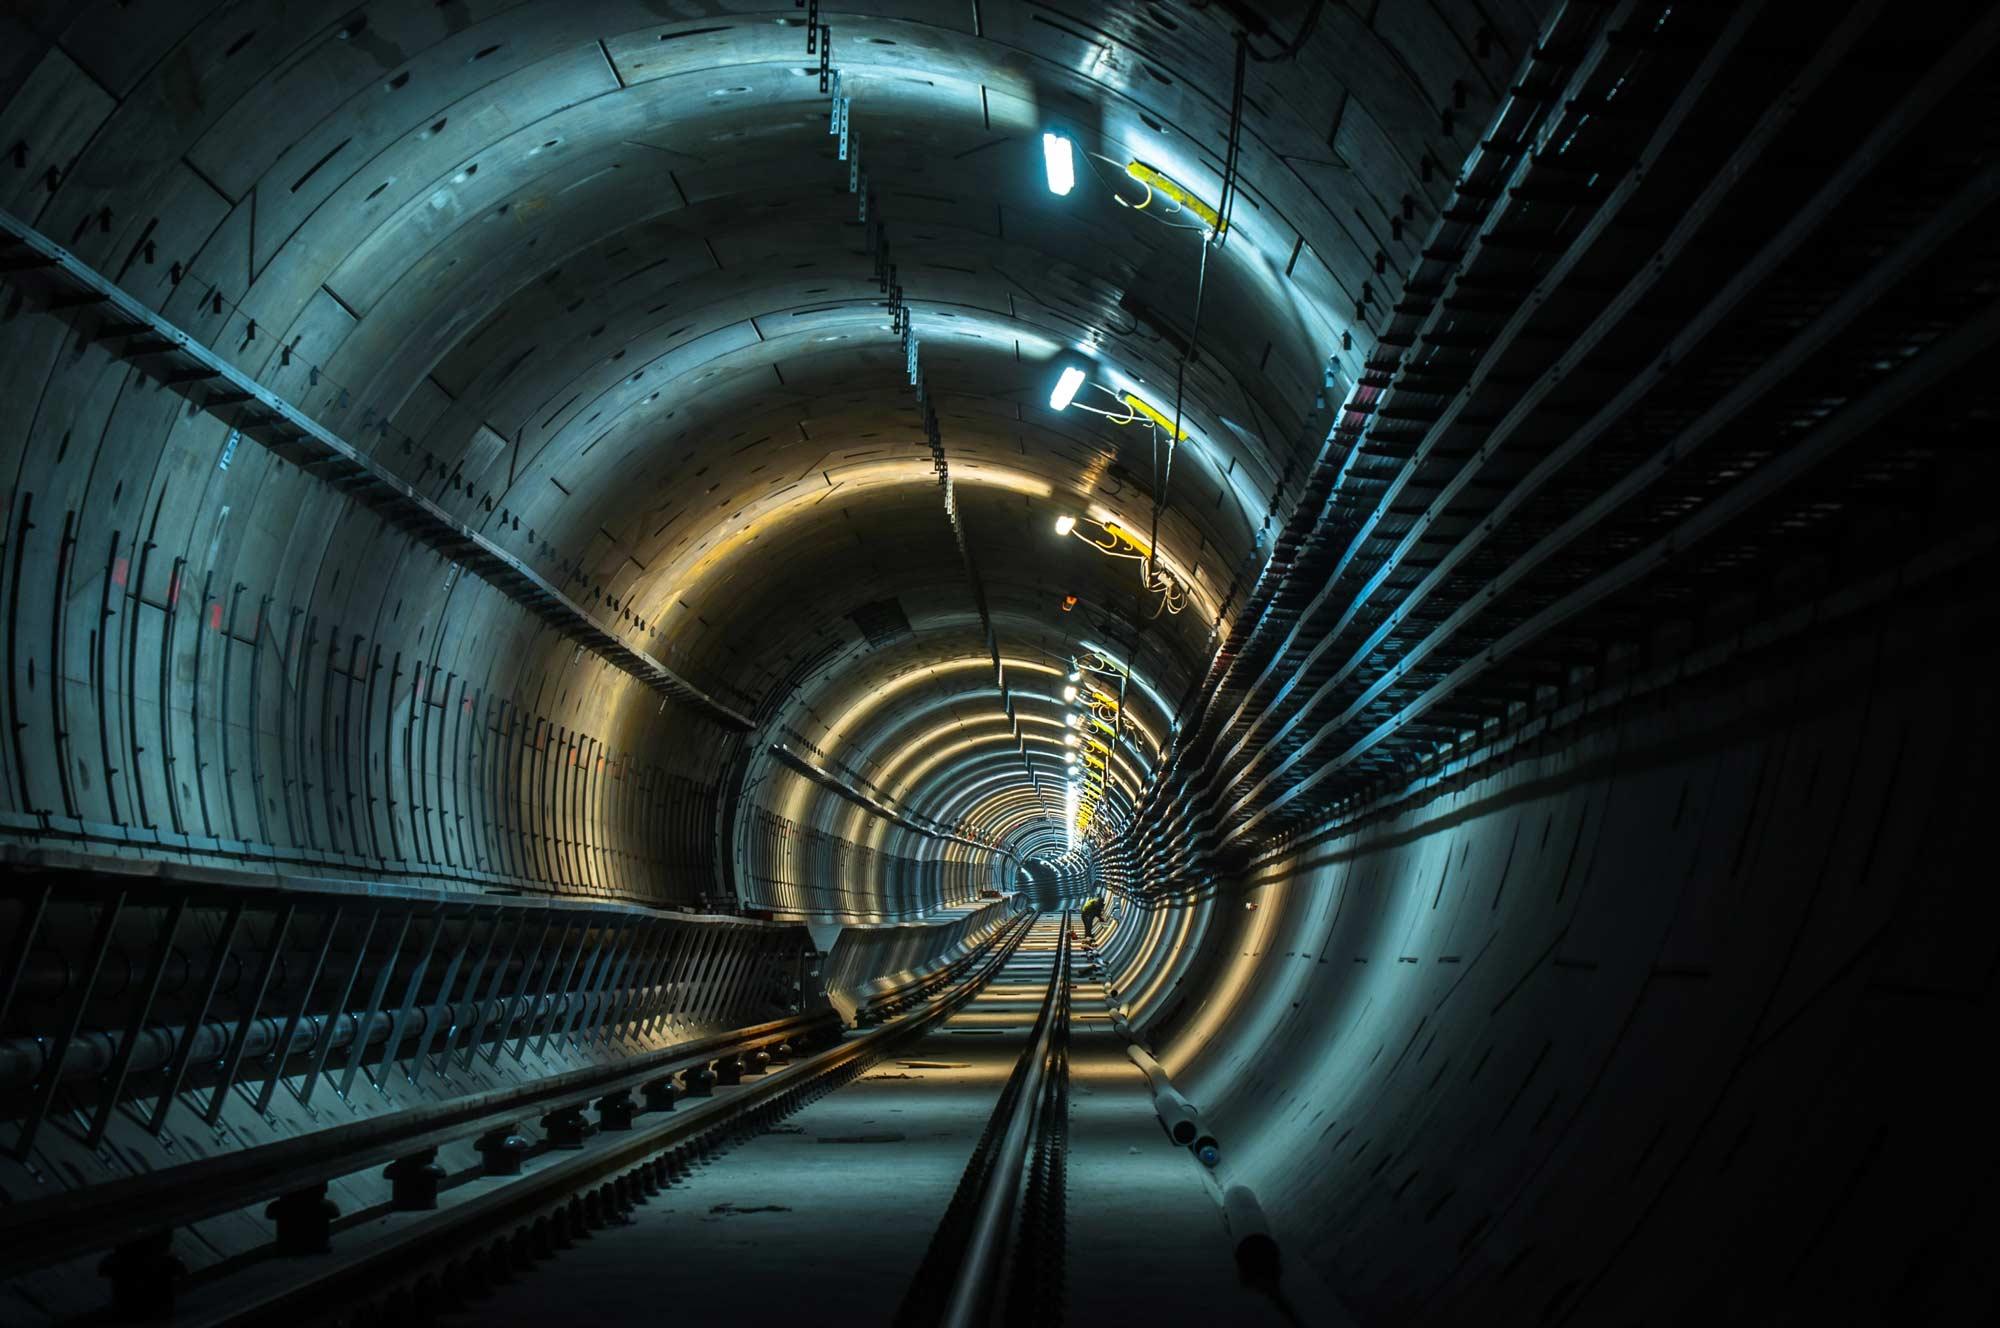 Metro tunnel post construction